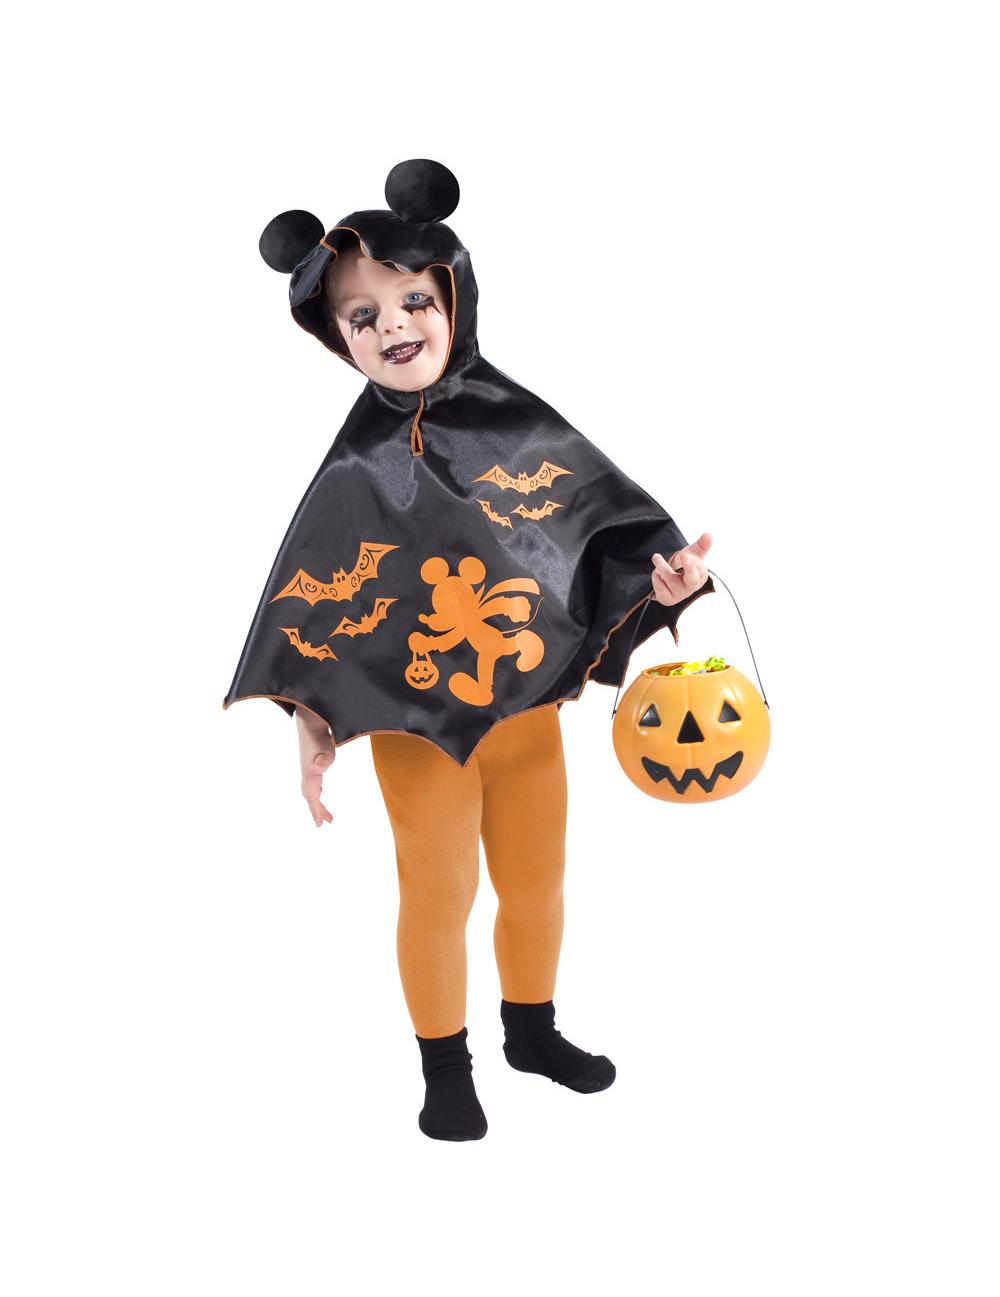 Capa mickey mouse halloween ni o accesorios y - Articulos halloween baratos ...